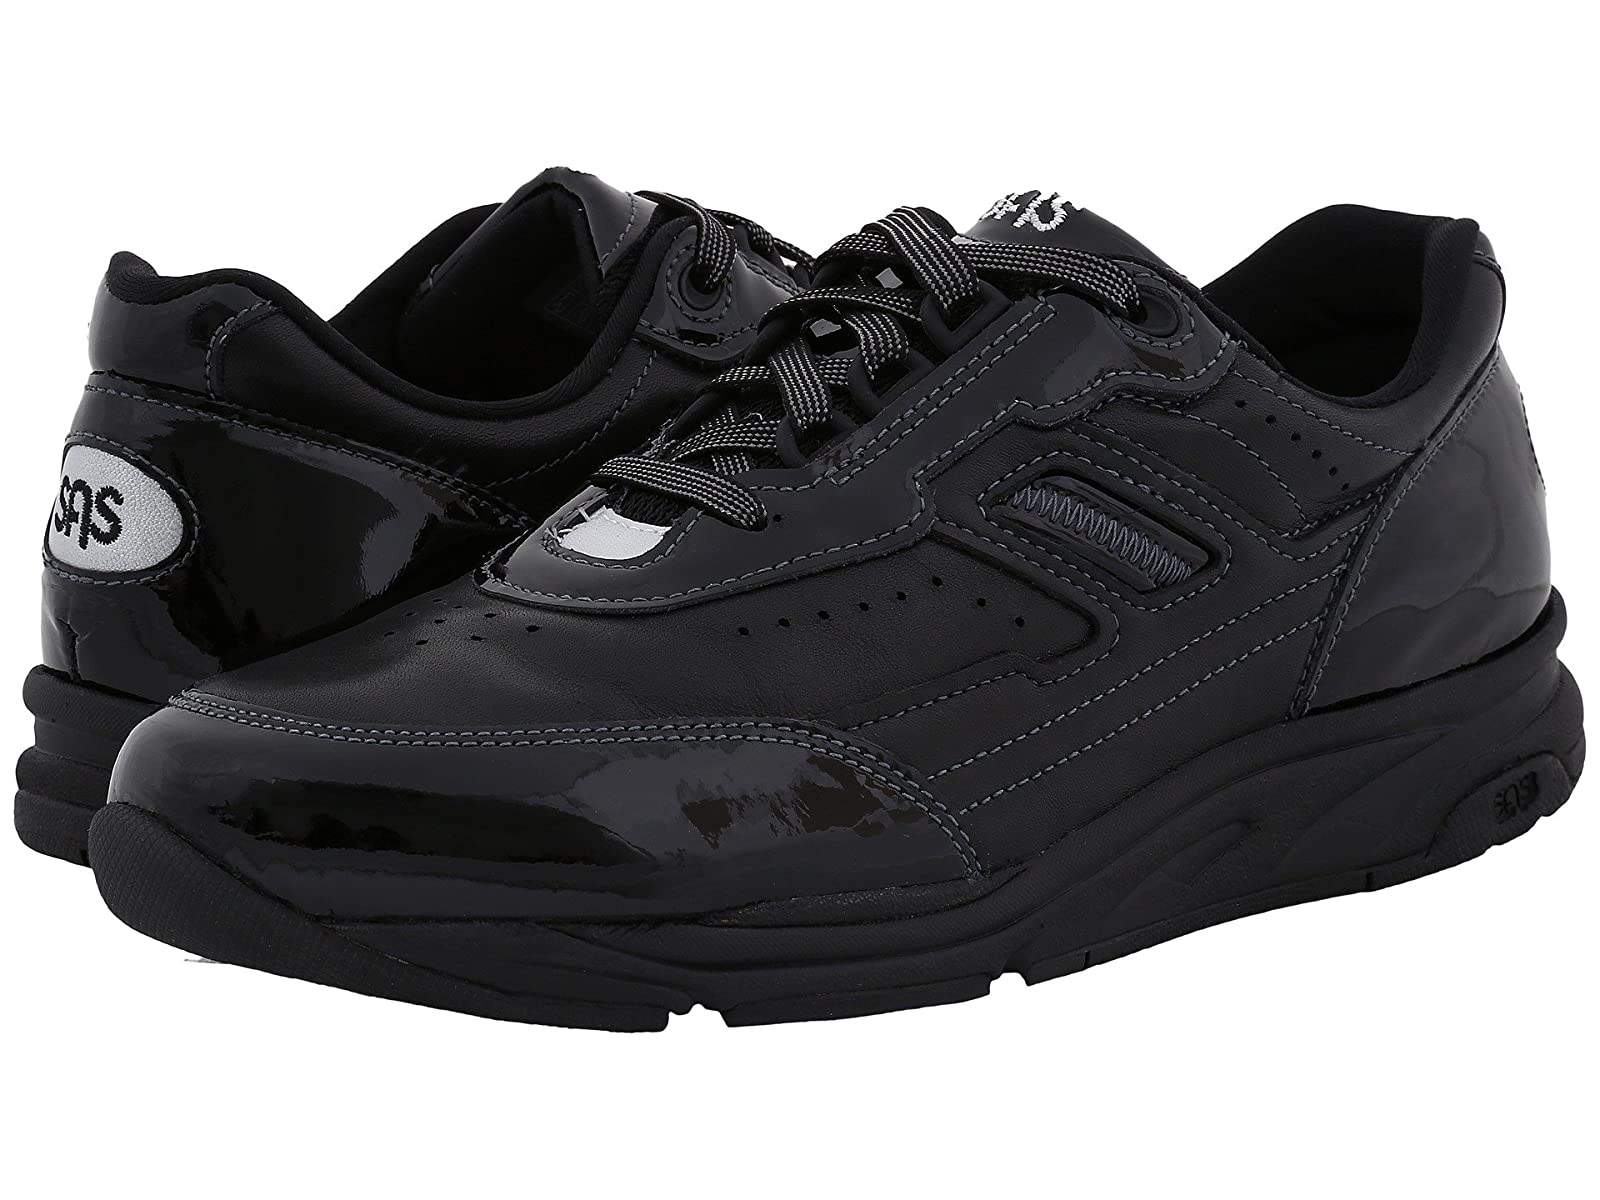 SAS TourCheap and distinctive eye-catching shoes